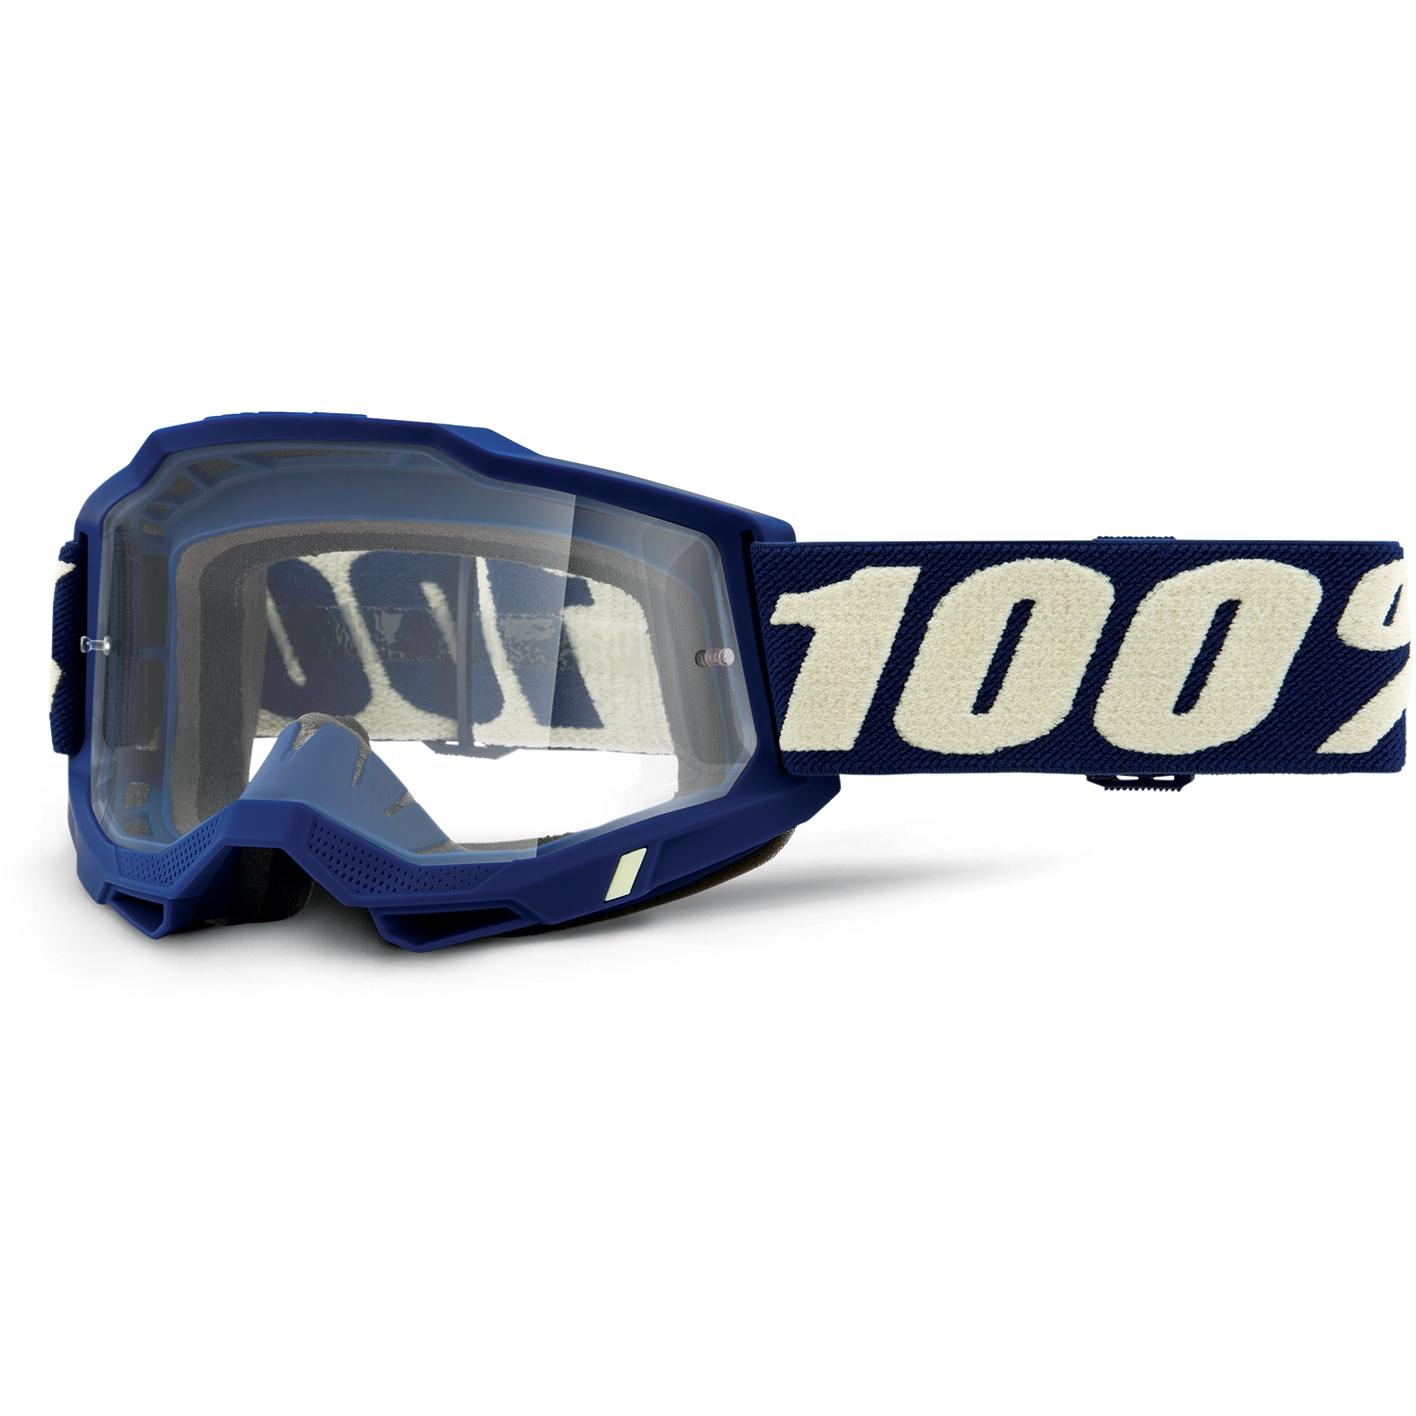 Imagen de 100% Accuri 2 Goggle Clear Lens Gafas - Deepmarine